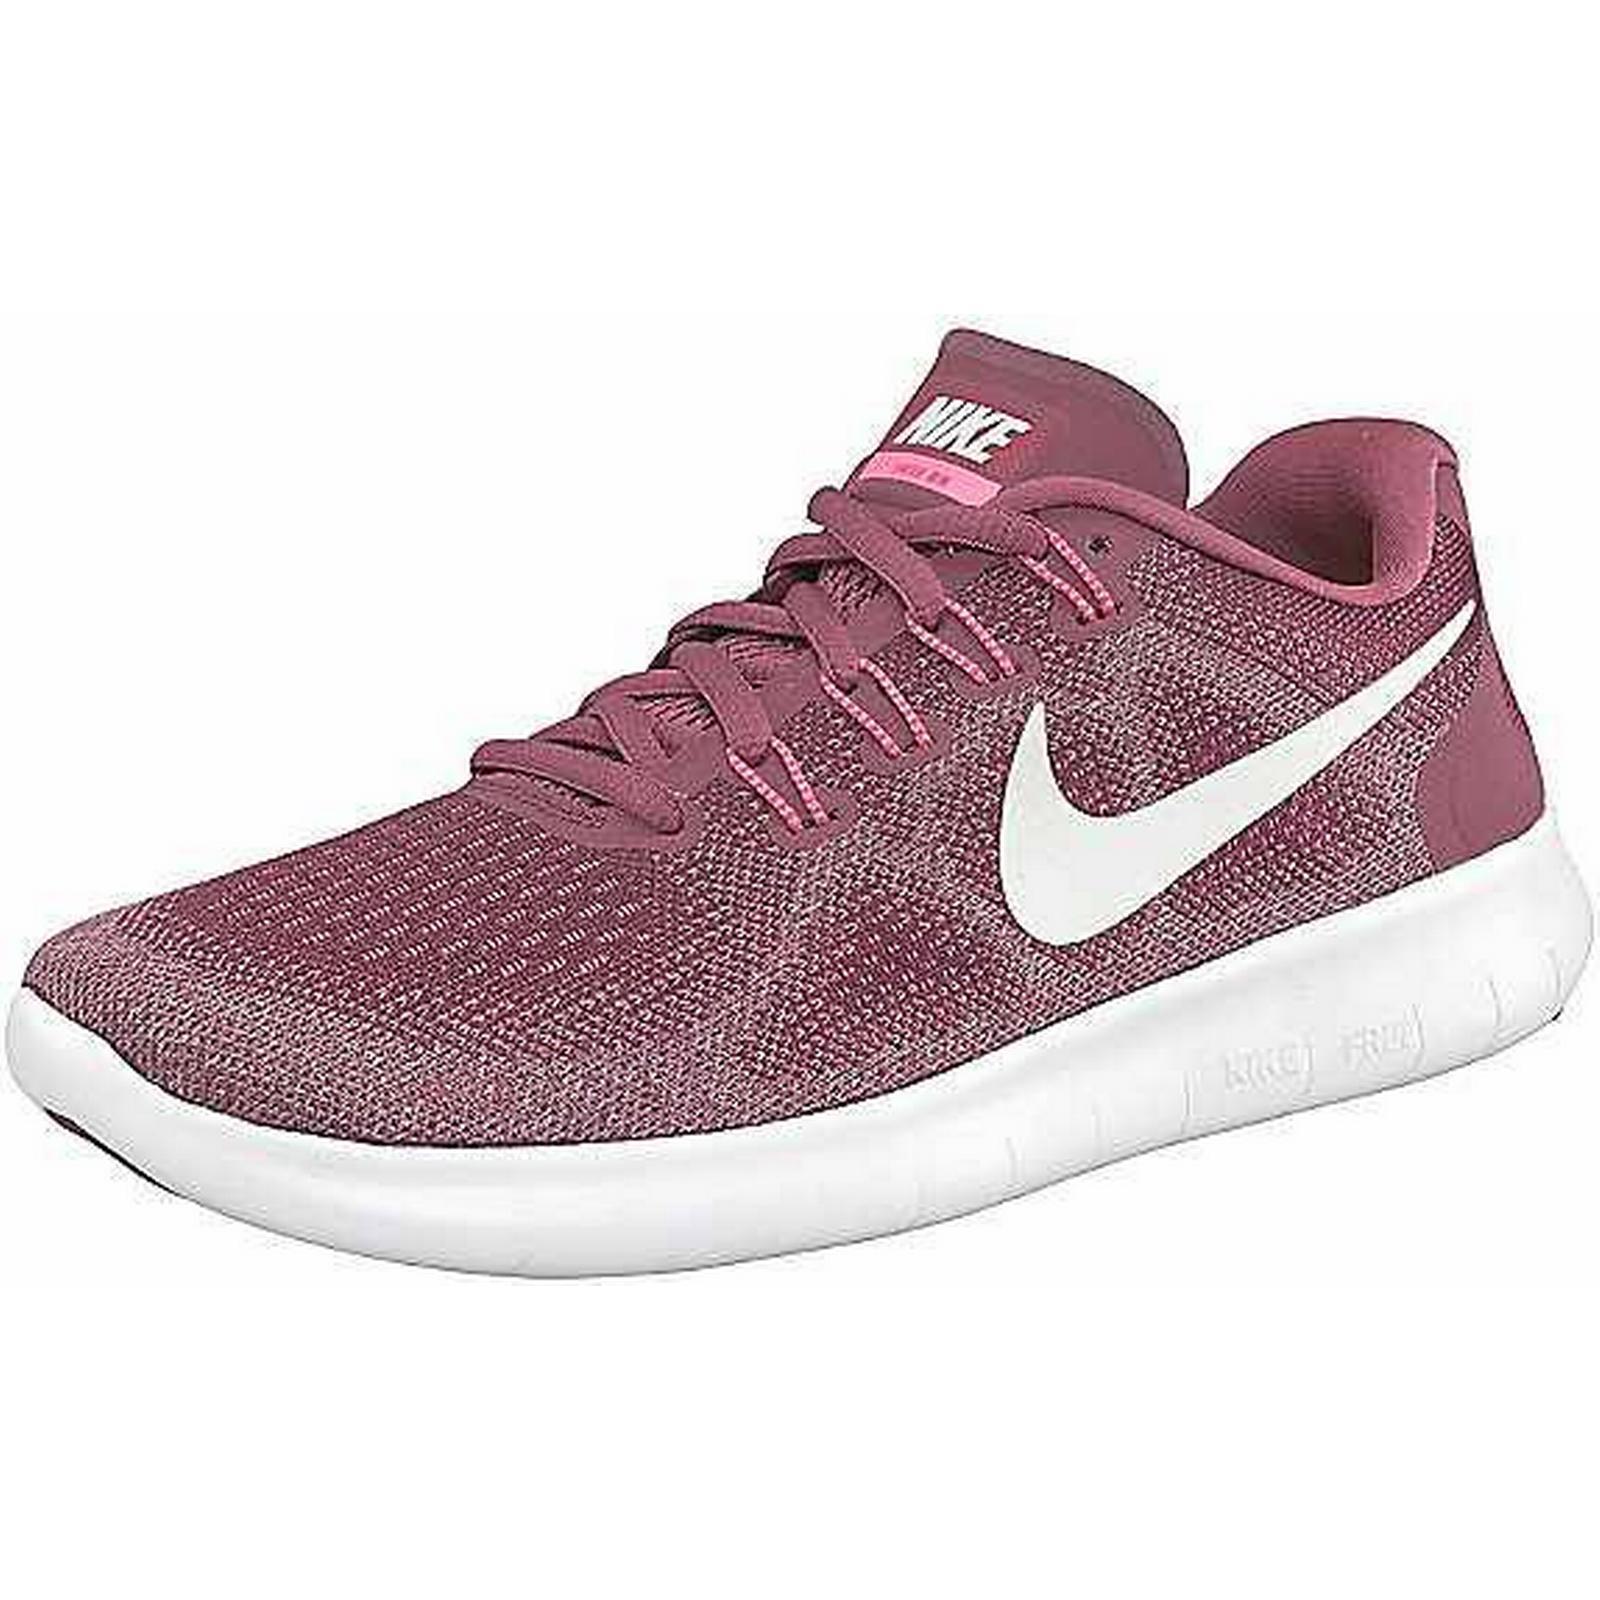 Man/Woman - Look Again Shoes 'Free Run 2' Running Shoes Again by Nike -  Massive new 6a45cf